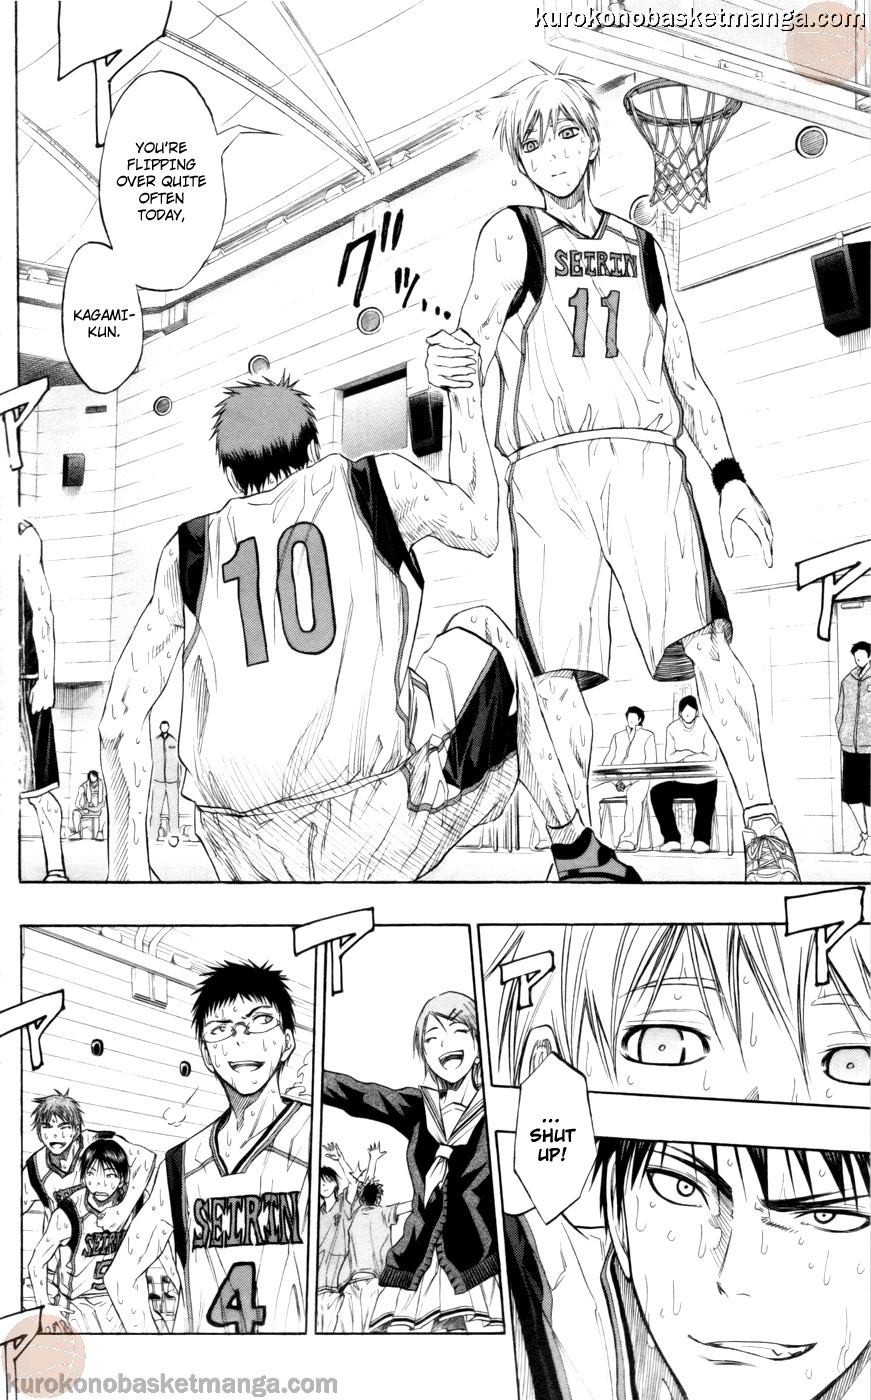 Kuroko no Basket Manga Chapter 83 - Image 18